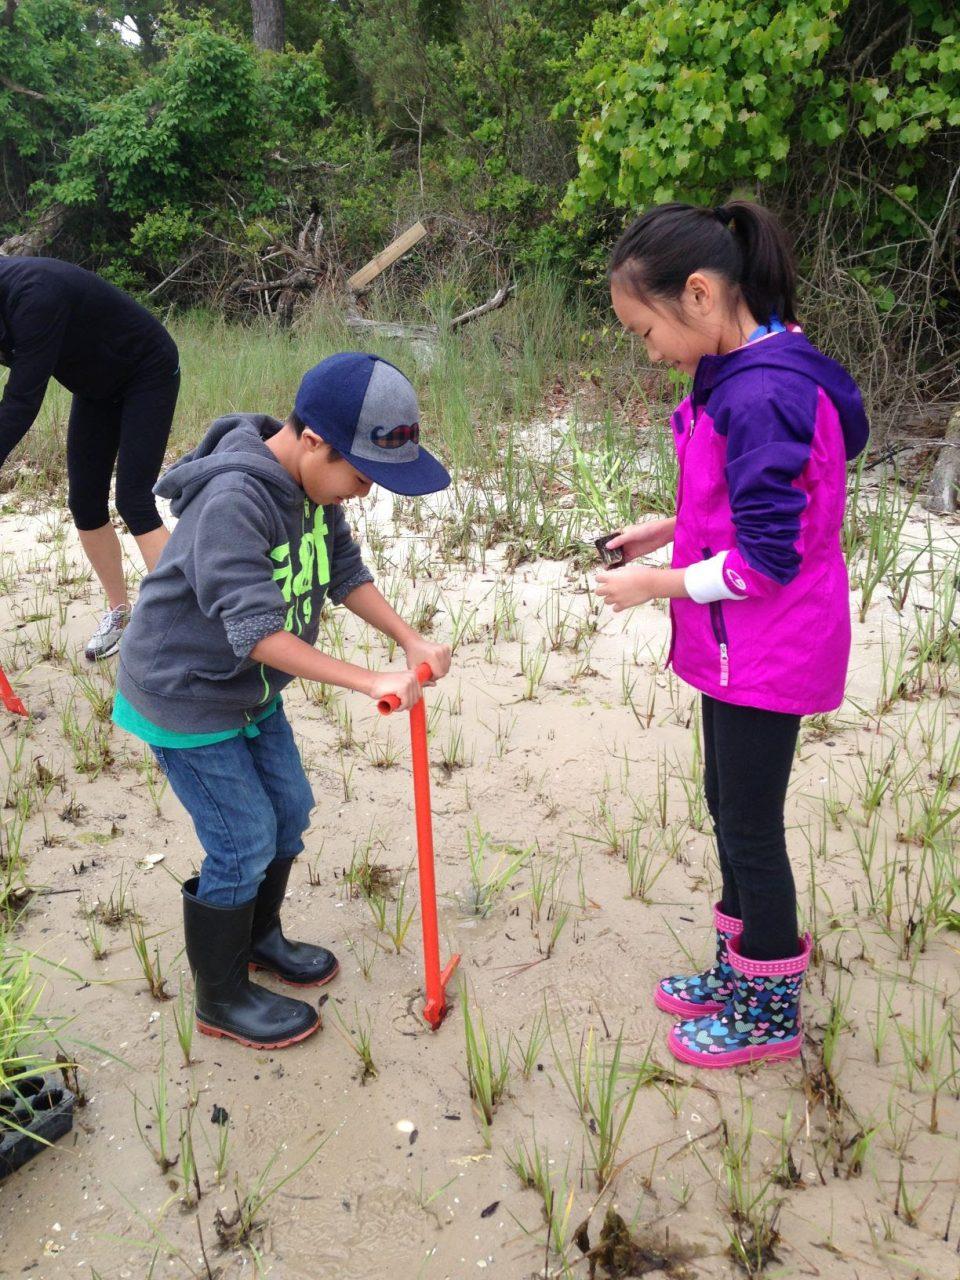 Volunteers are needed to salt marsh grasses at a the North Carolina Coastal Federation's Future Center for Coastal Protection and Restoration. Photo: Coastal Federation